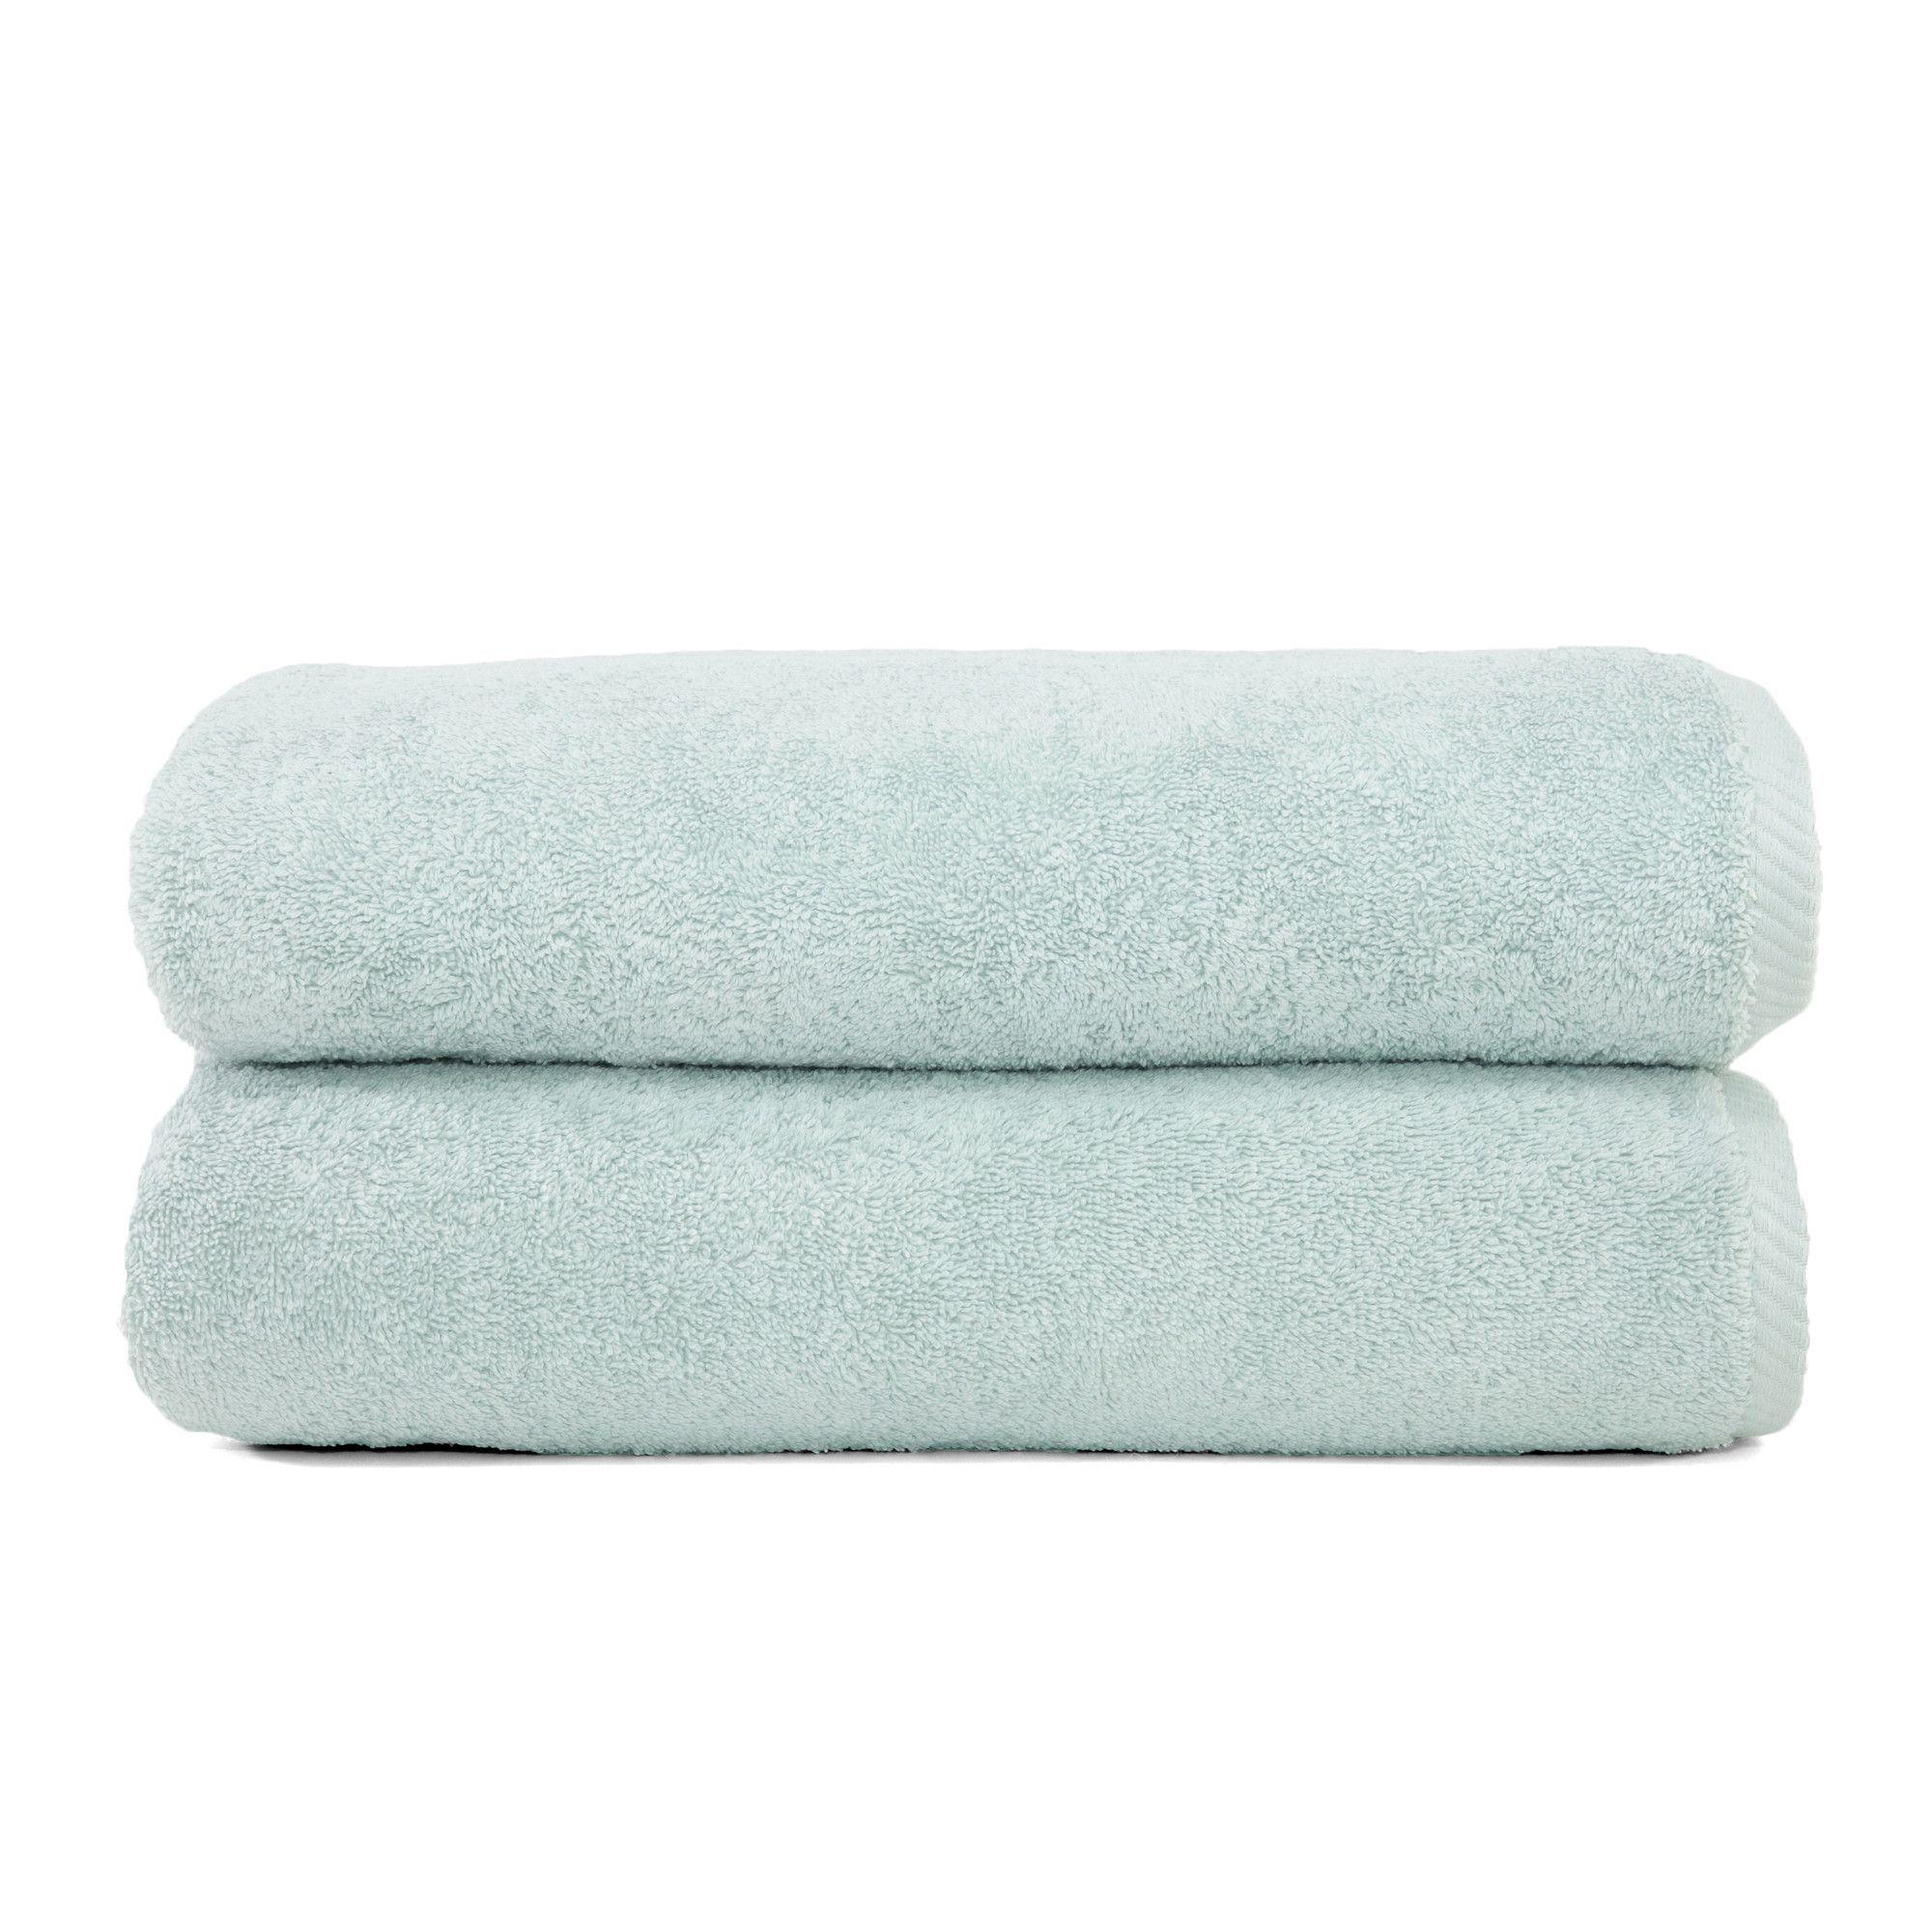 Luxury Hotel Spa 100 Turkish Cotton Soft Twist Bath Towel